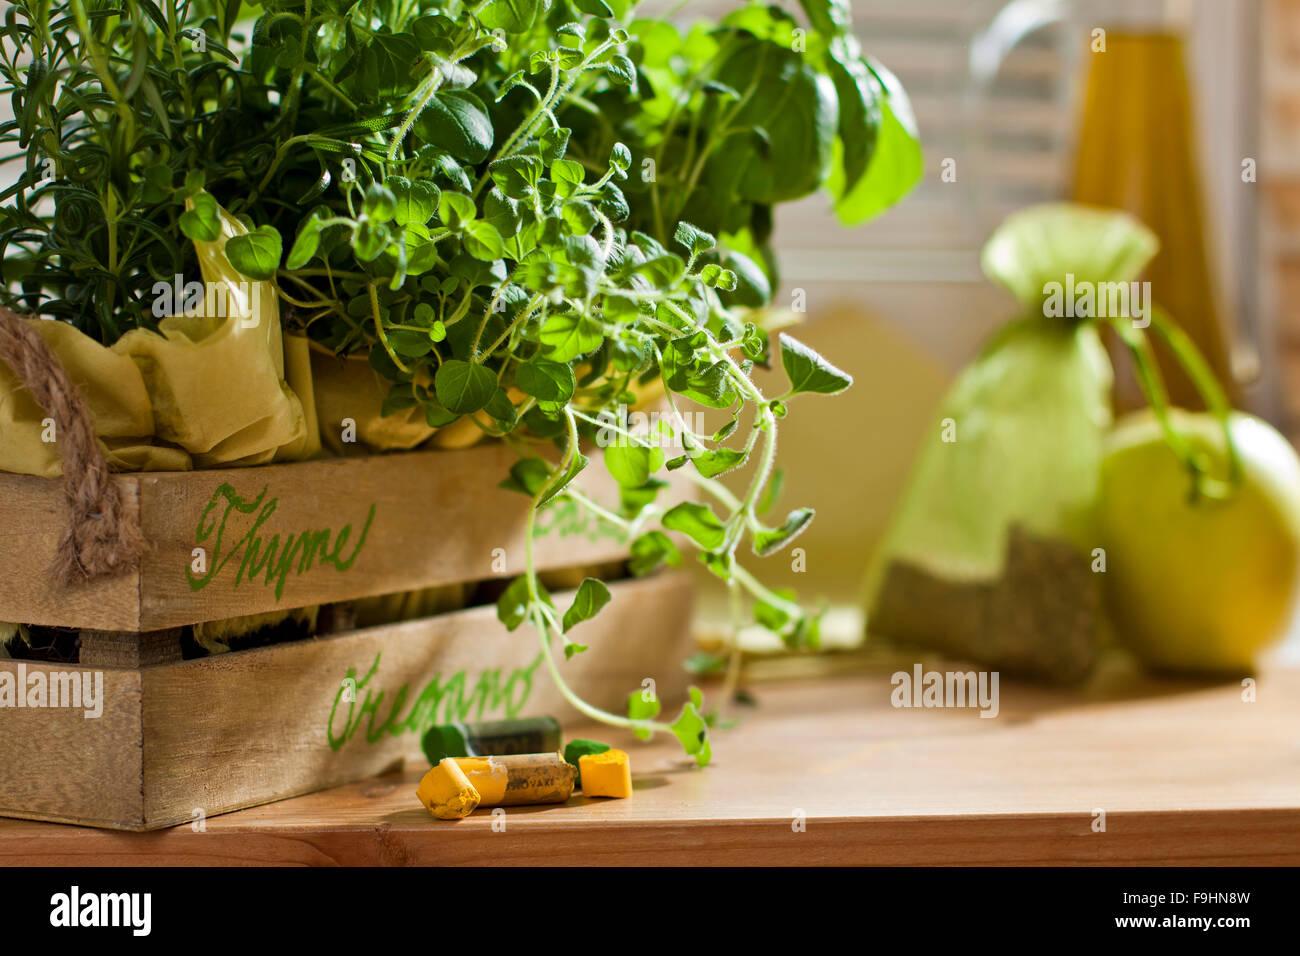 chalk signe name herbs - Stock Image